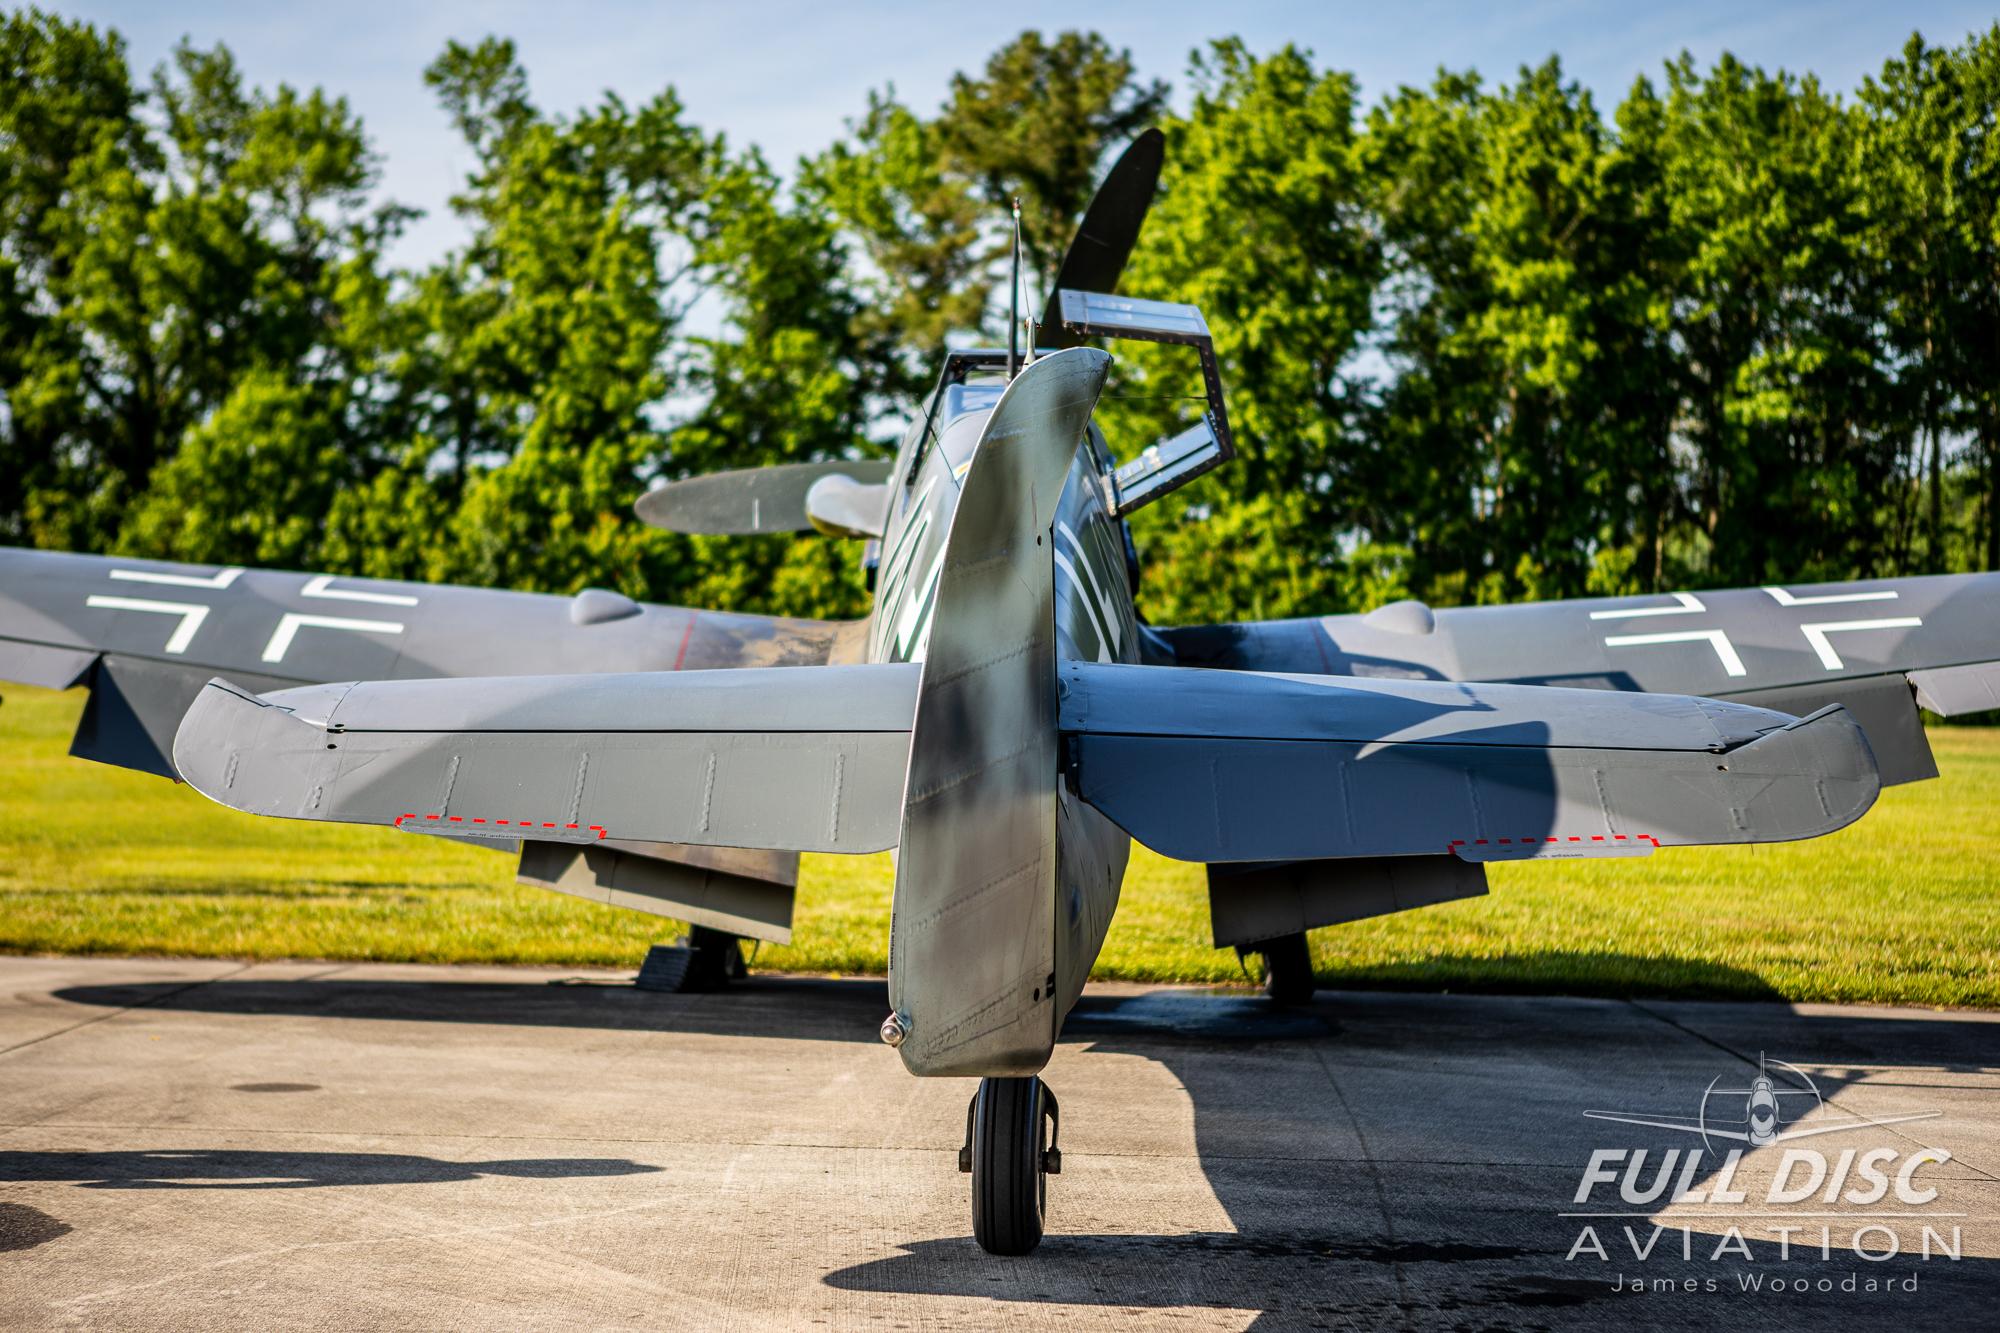 WarbirdsOverTheBeach_FullDiscAviation_JamesWoodard-May 18, 2019-41.jpg